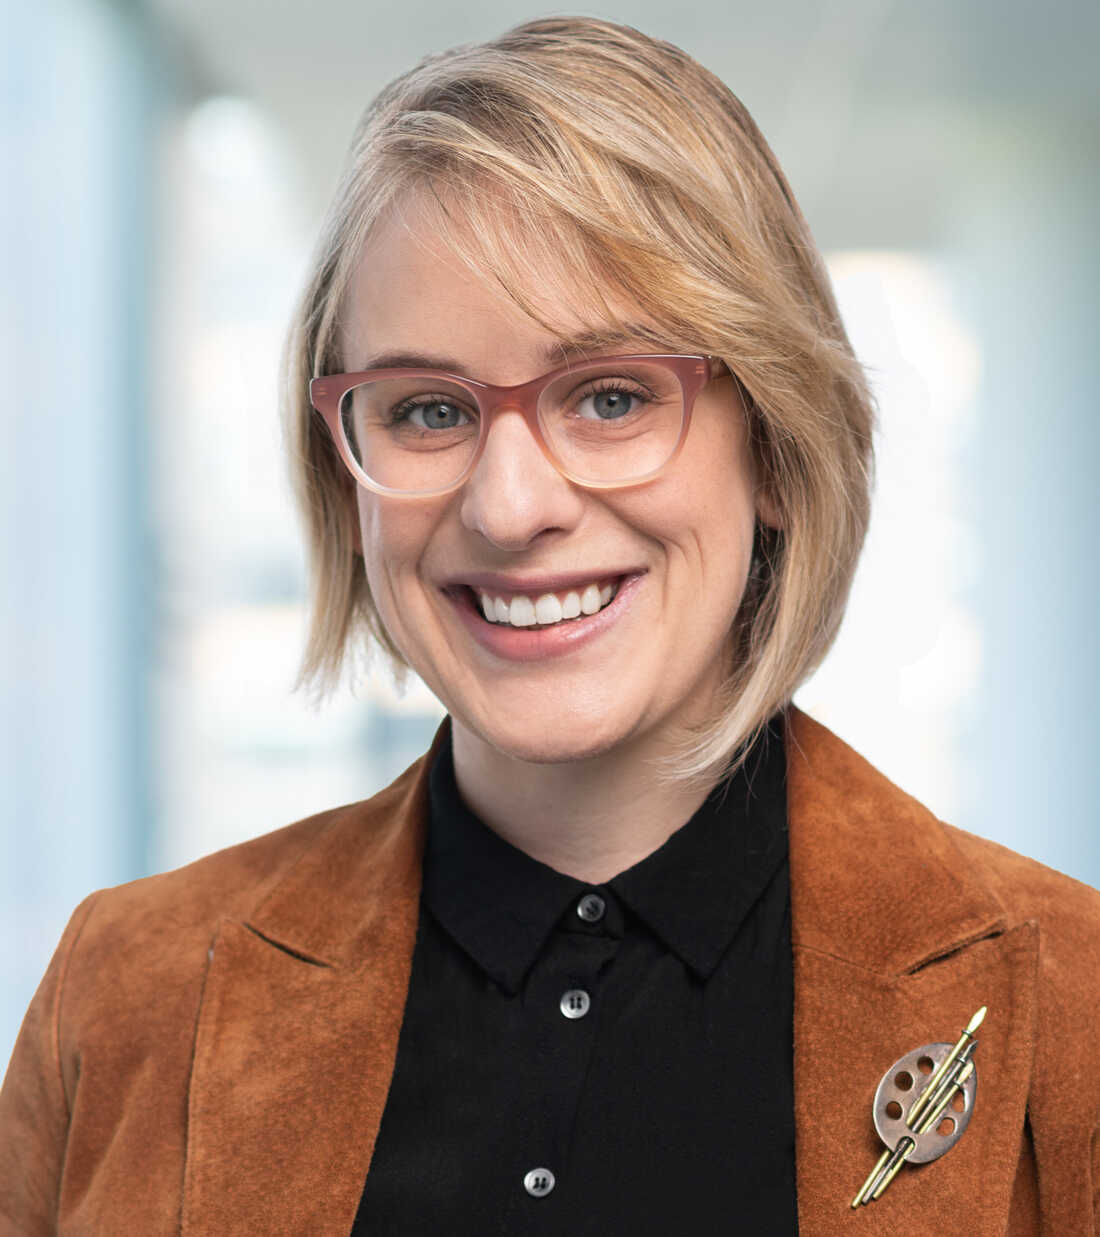 Lindsay Johnson, photographed for NPR, 22 January 2020, in Washington DC.